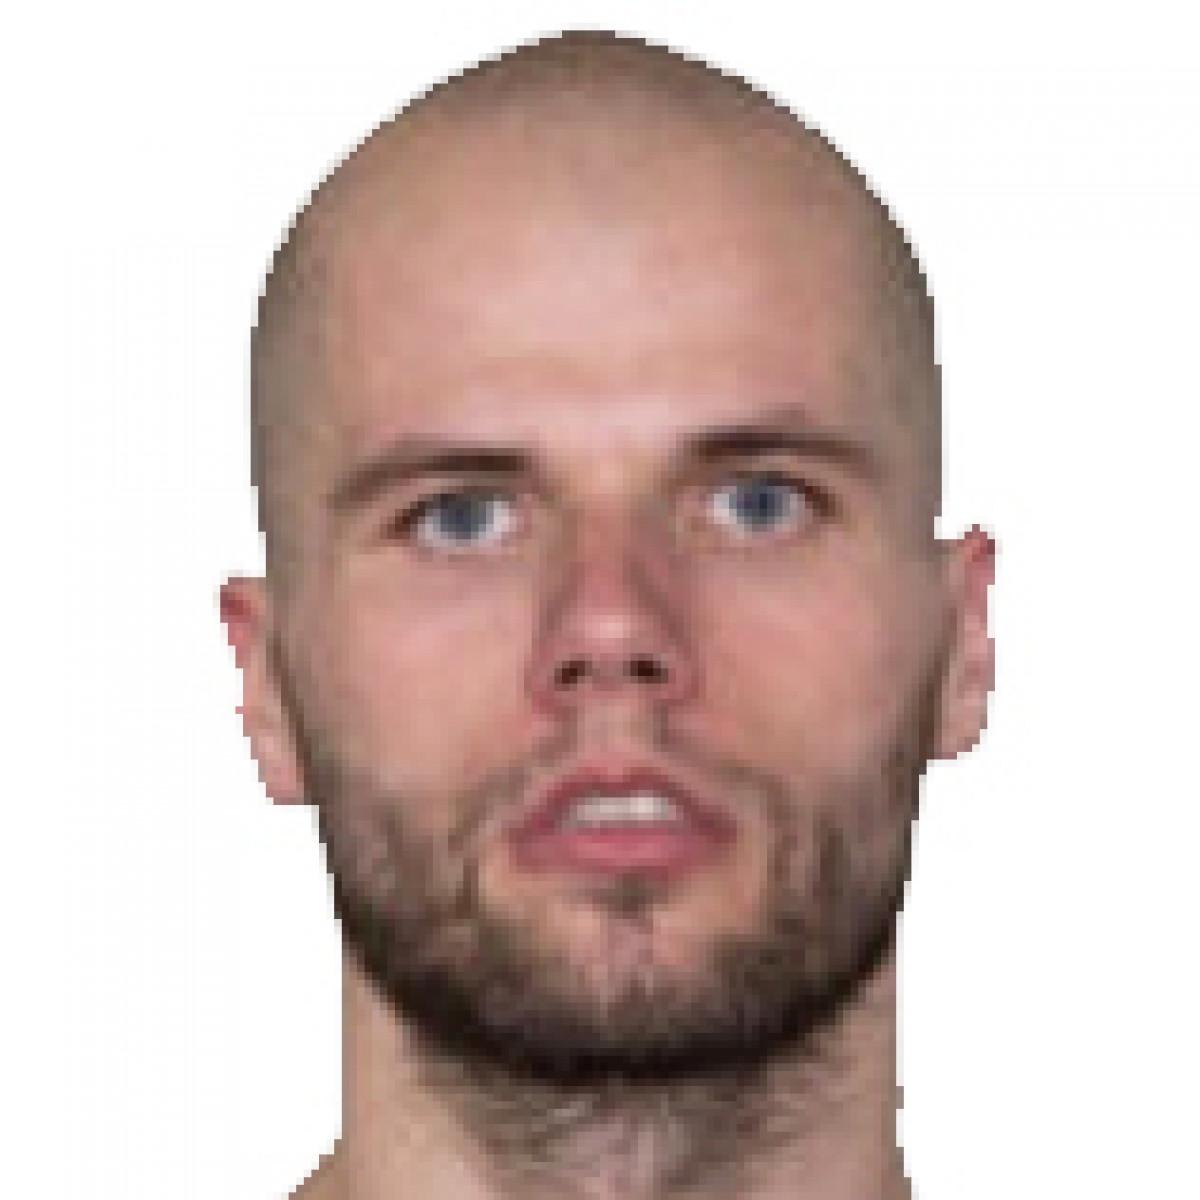 Marko Radonjic